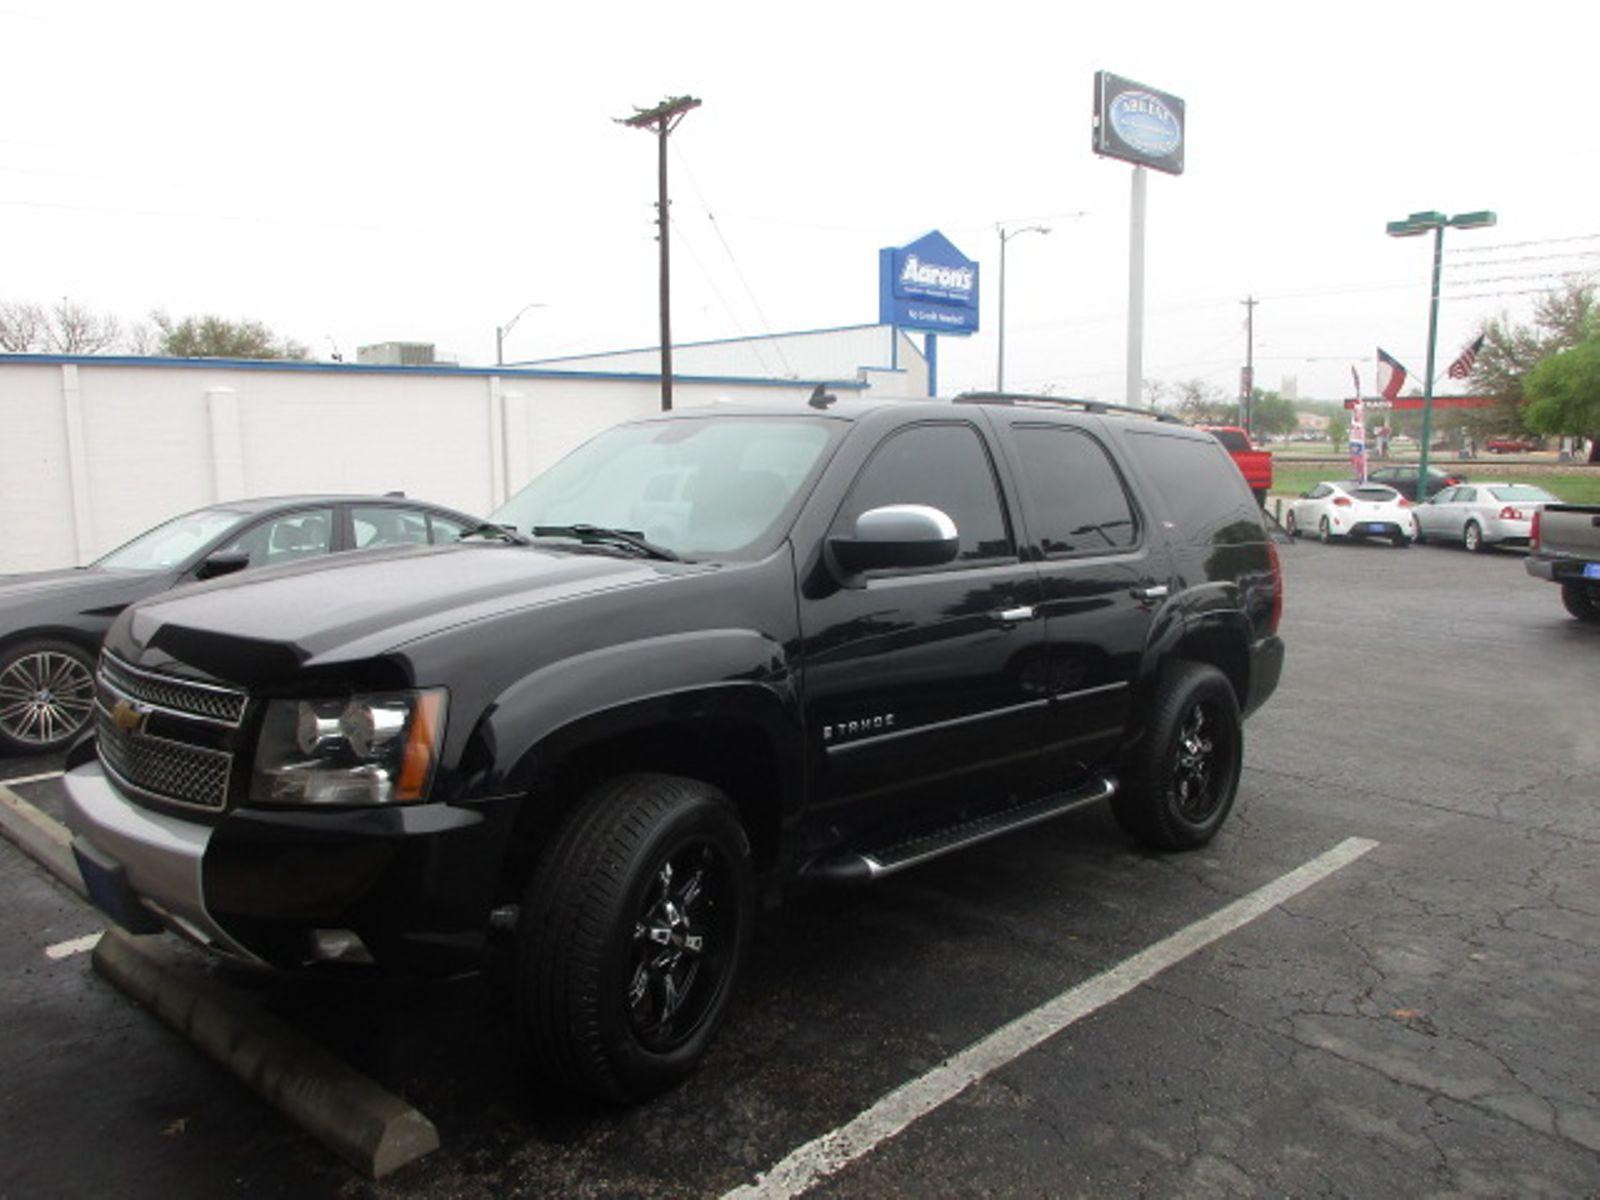 motors pharr tahoe chevrolet inc ltz panther vehicle city texas revo in